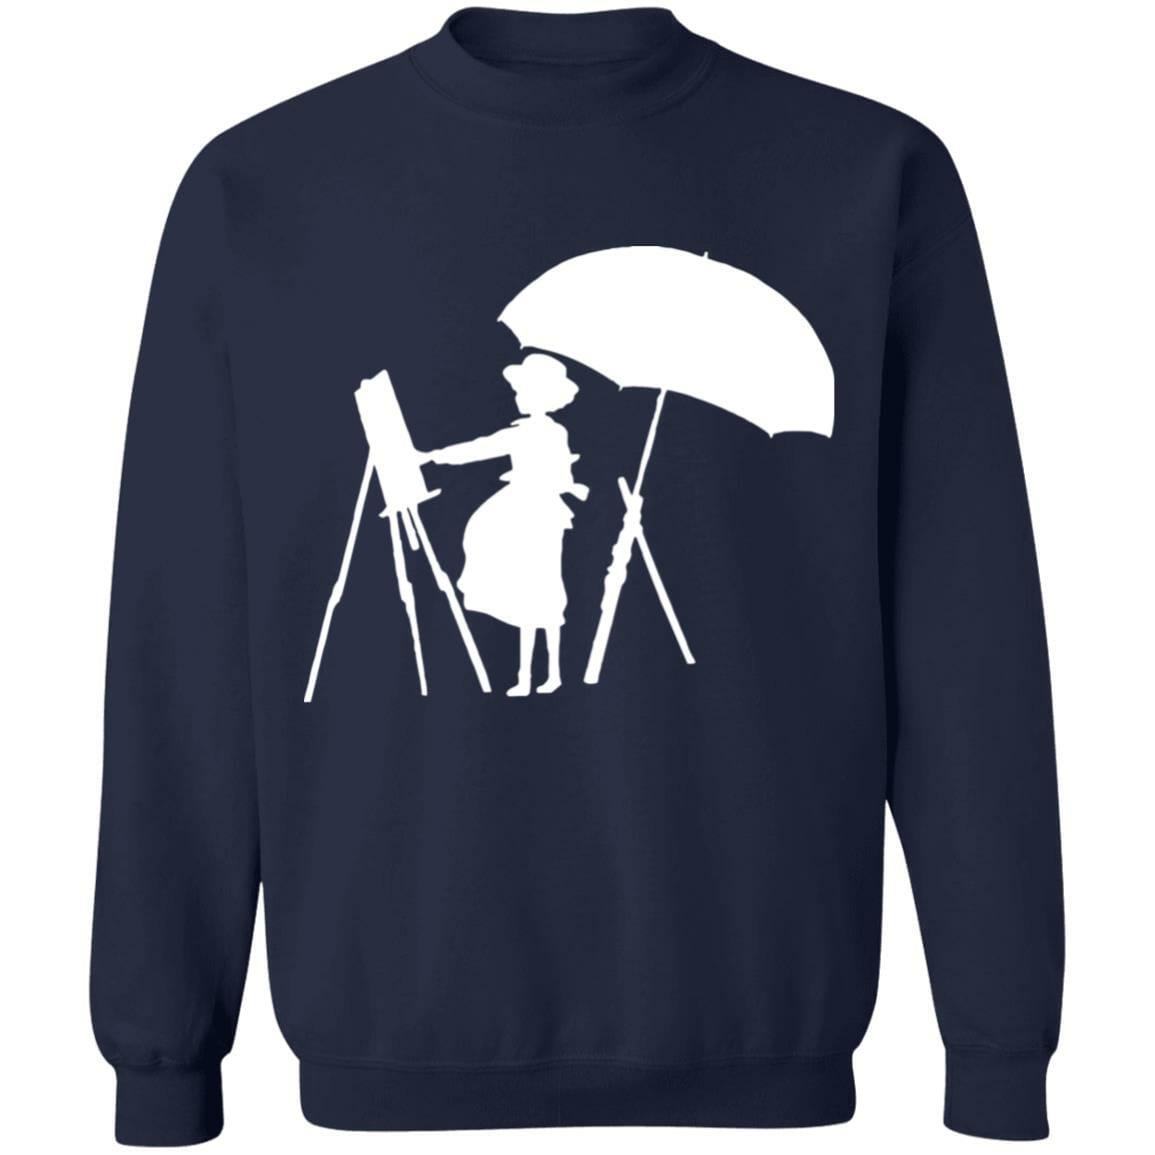 The Wind Rises Cutout Black & White Sweatshirt